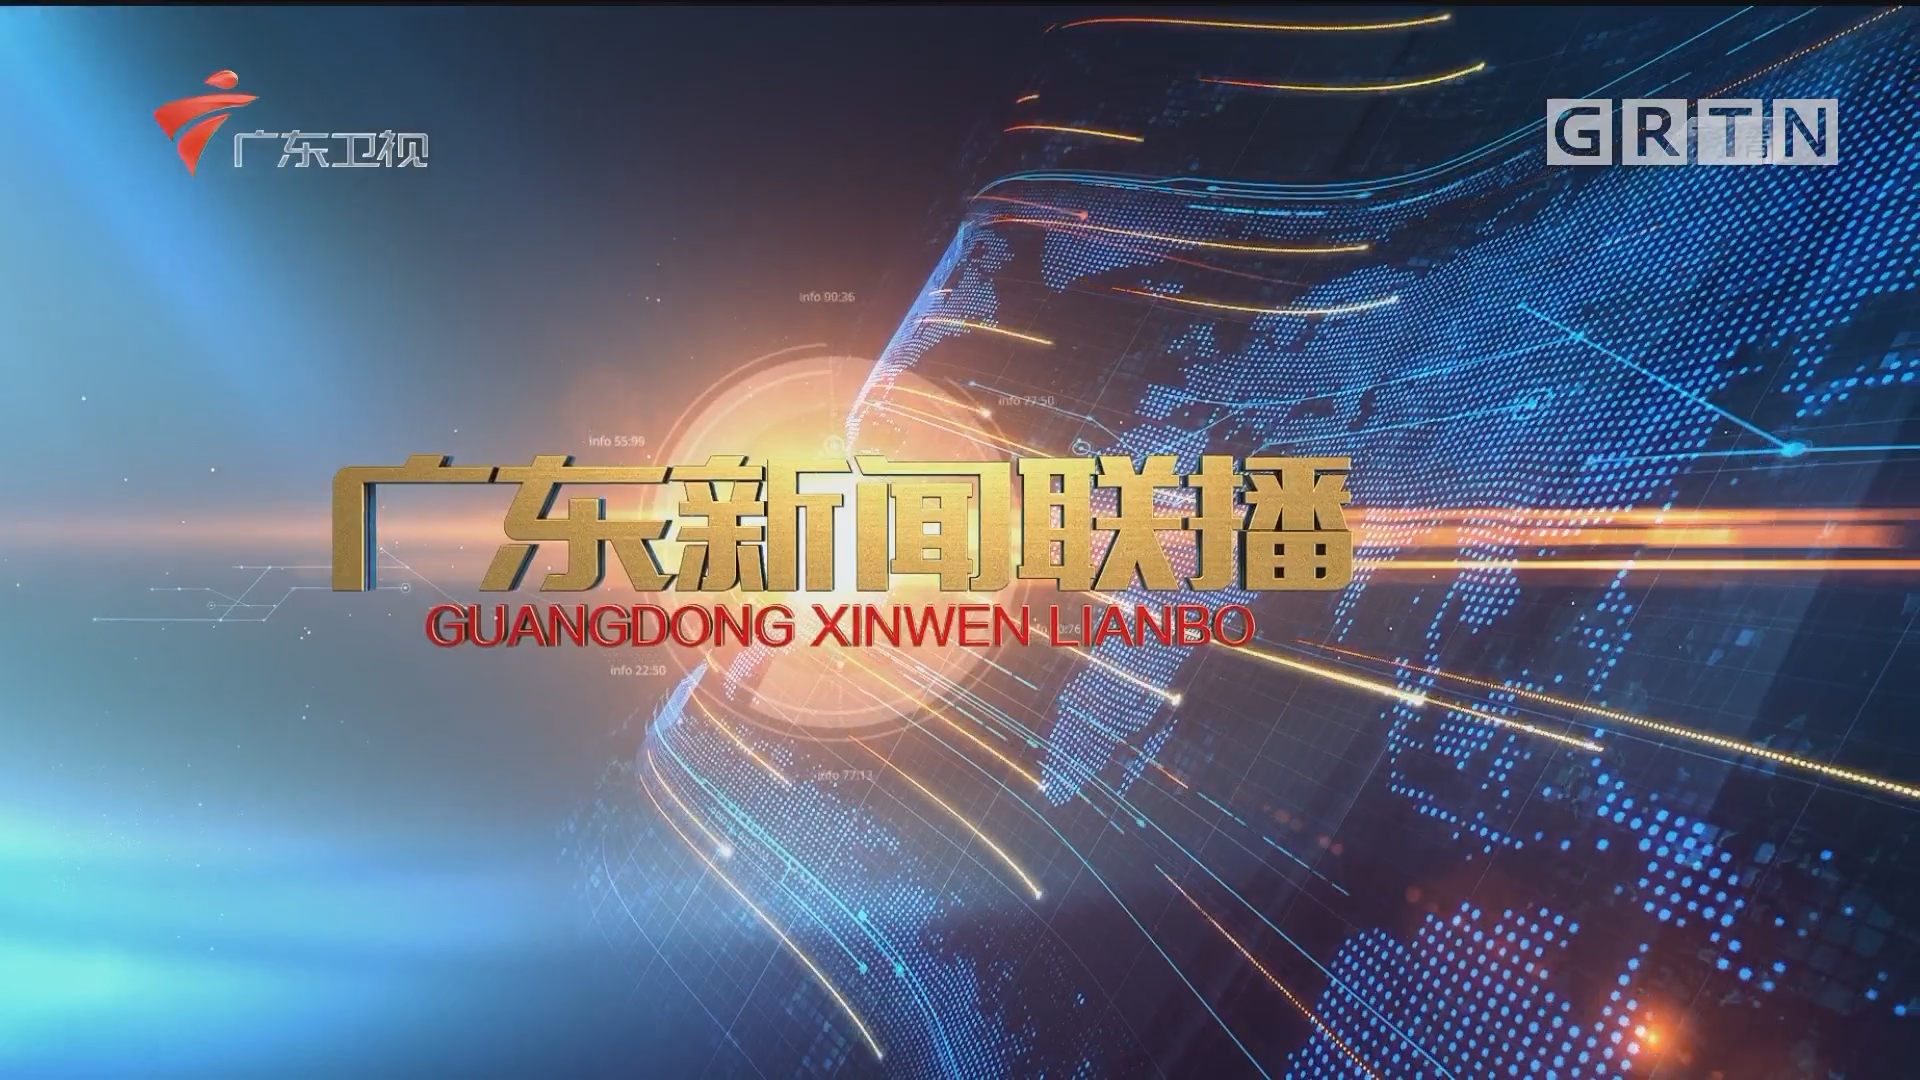 [HD][2017-10-21]广东新闻联播:广东代表团讨论党章修正案